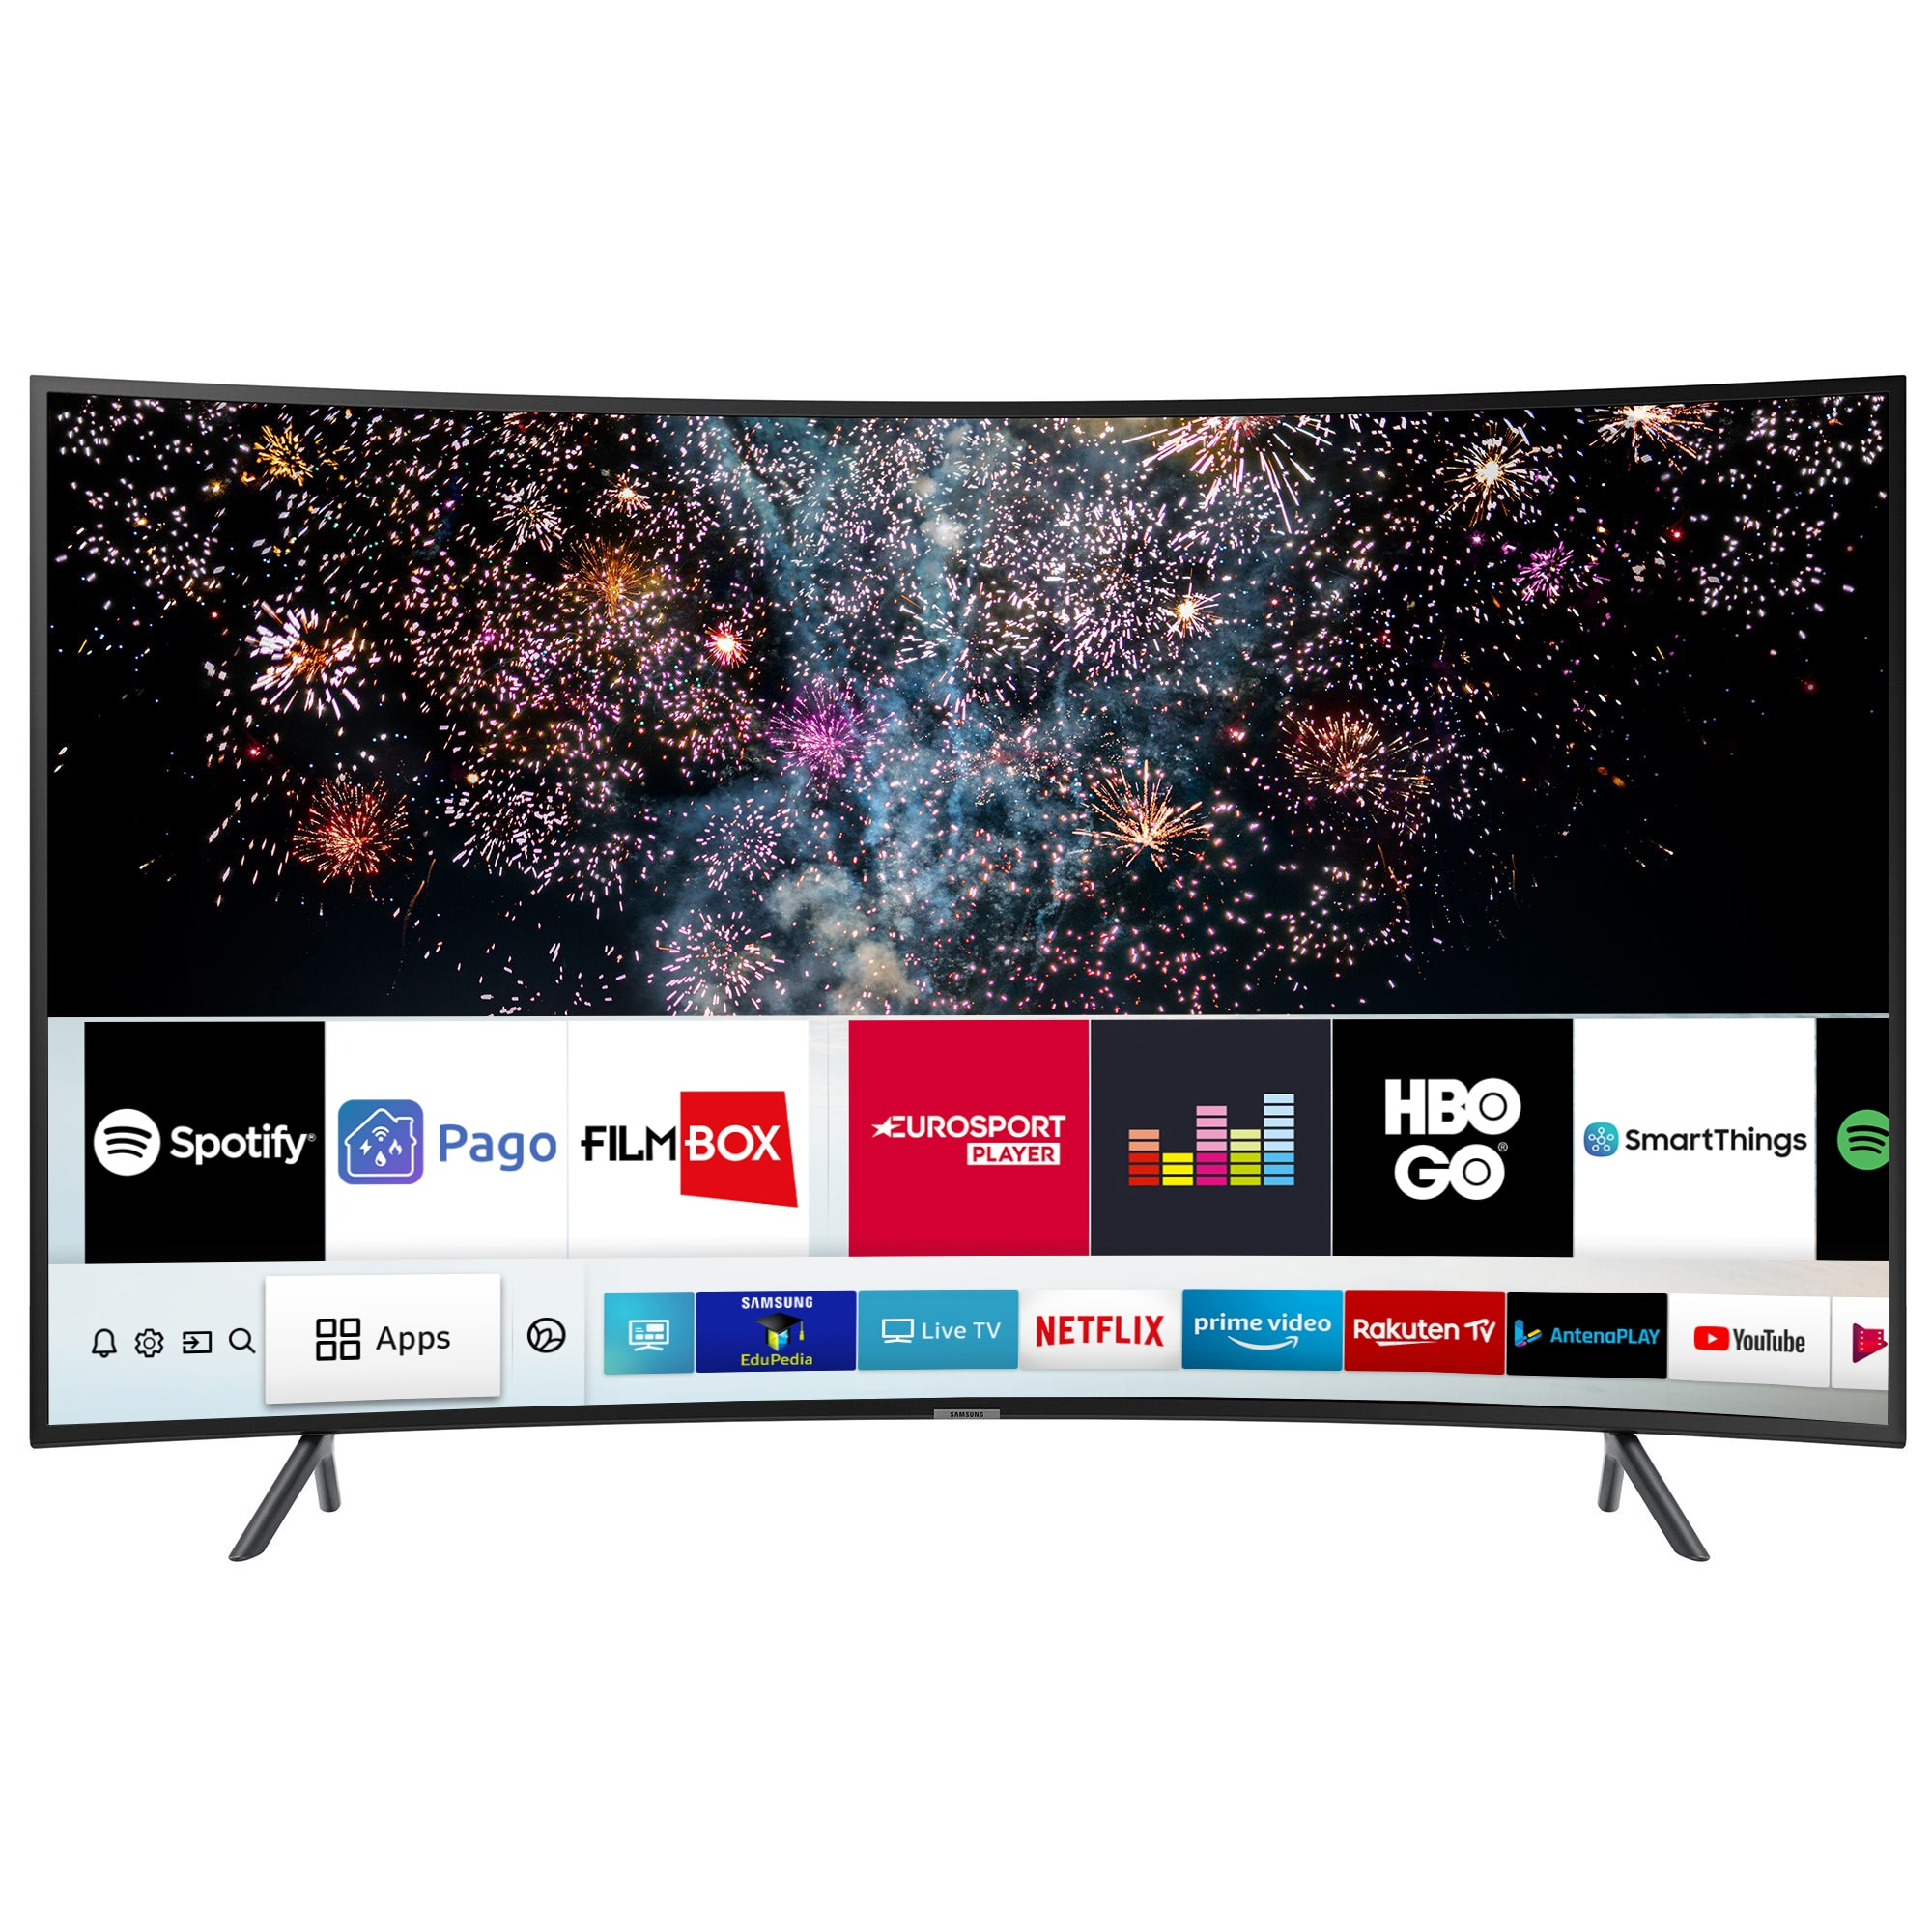 Fotografie Televizor LED curbat Smart Samsung, 123 cm, 49RU7302, 4K Ultra HD